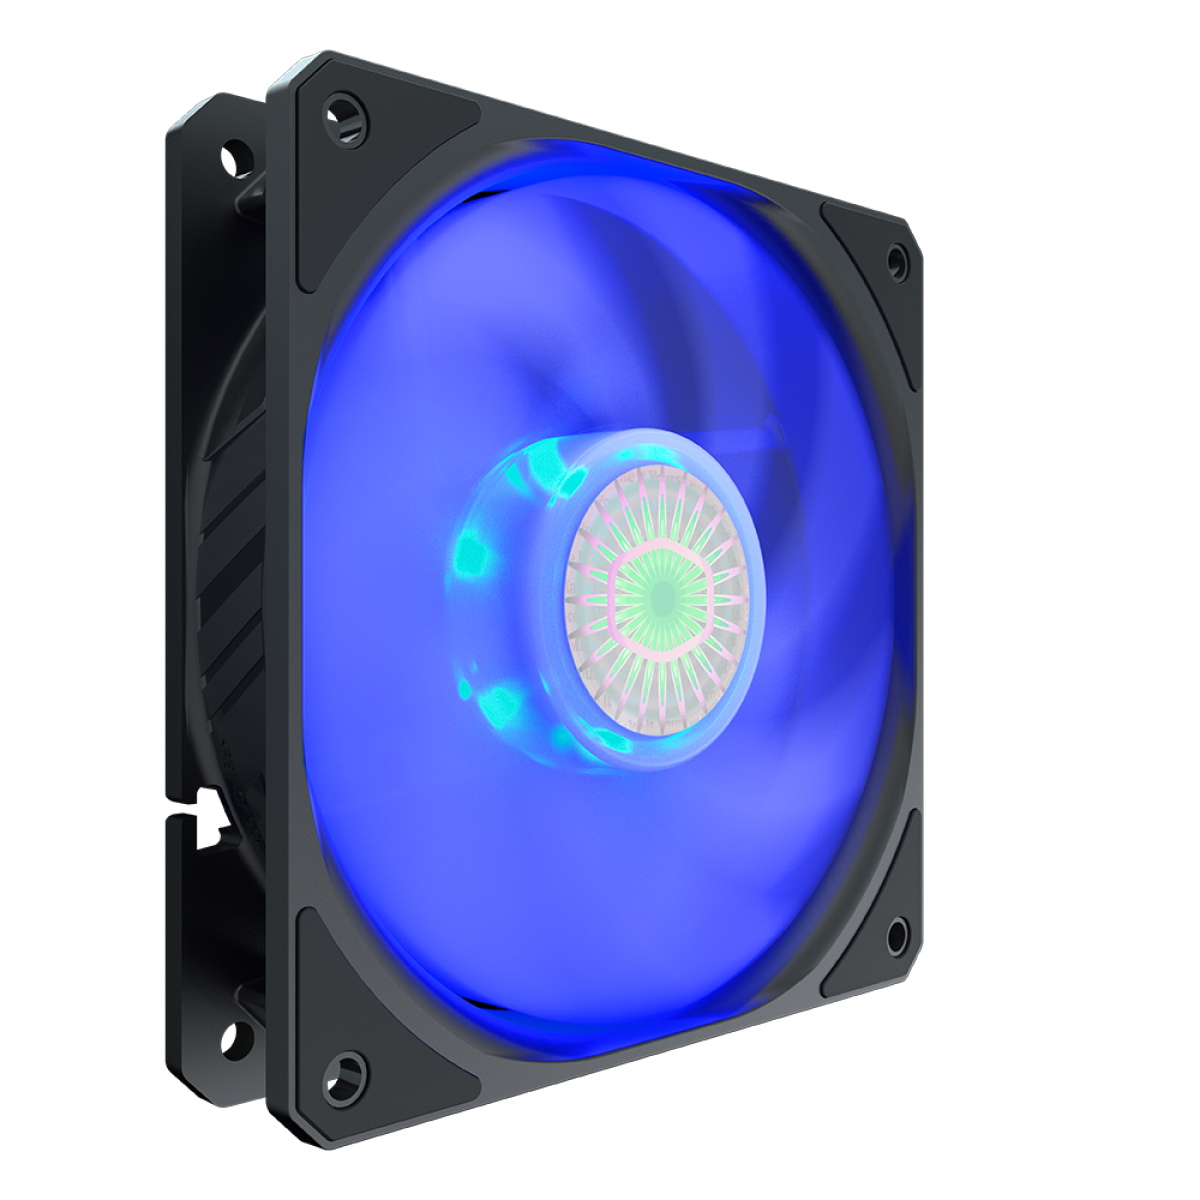 Cooler para Gabinete, Cooler Master, SickleFlow MasterFan MF120 Halo, Blue, 120mm, 1800RPM, MFX-B2DN-18NPB-R1